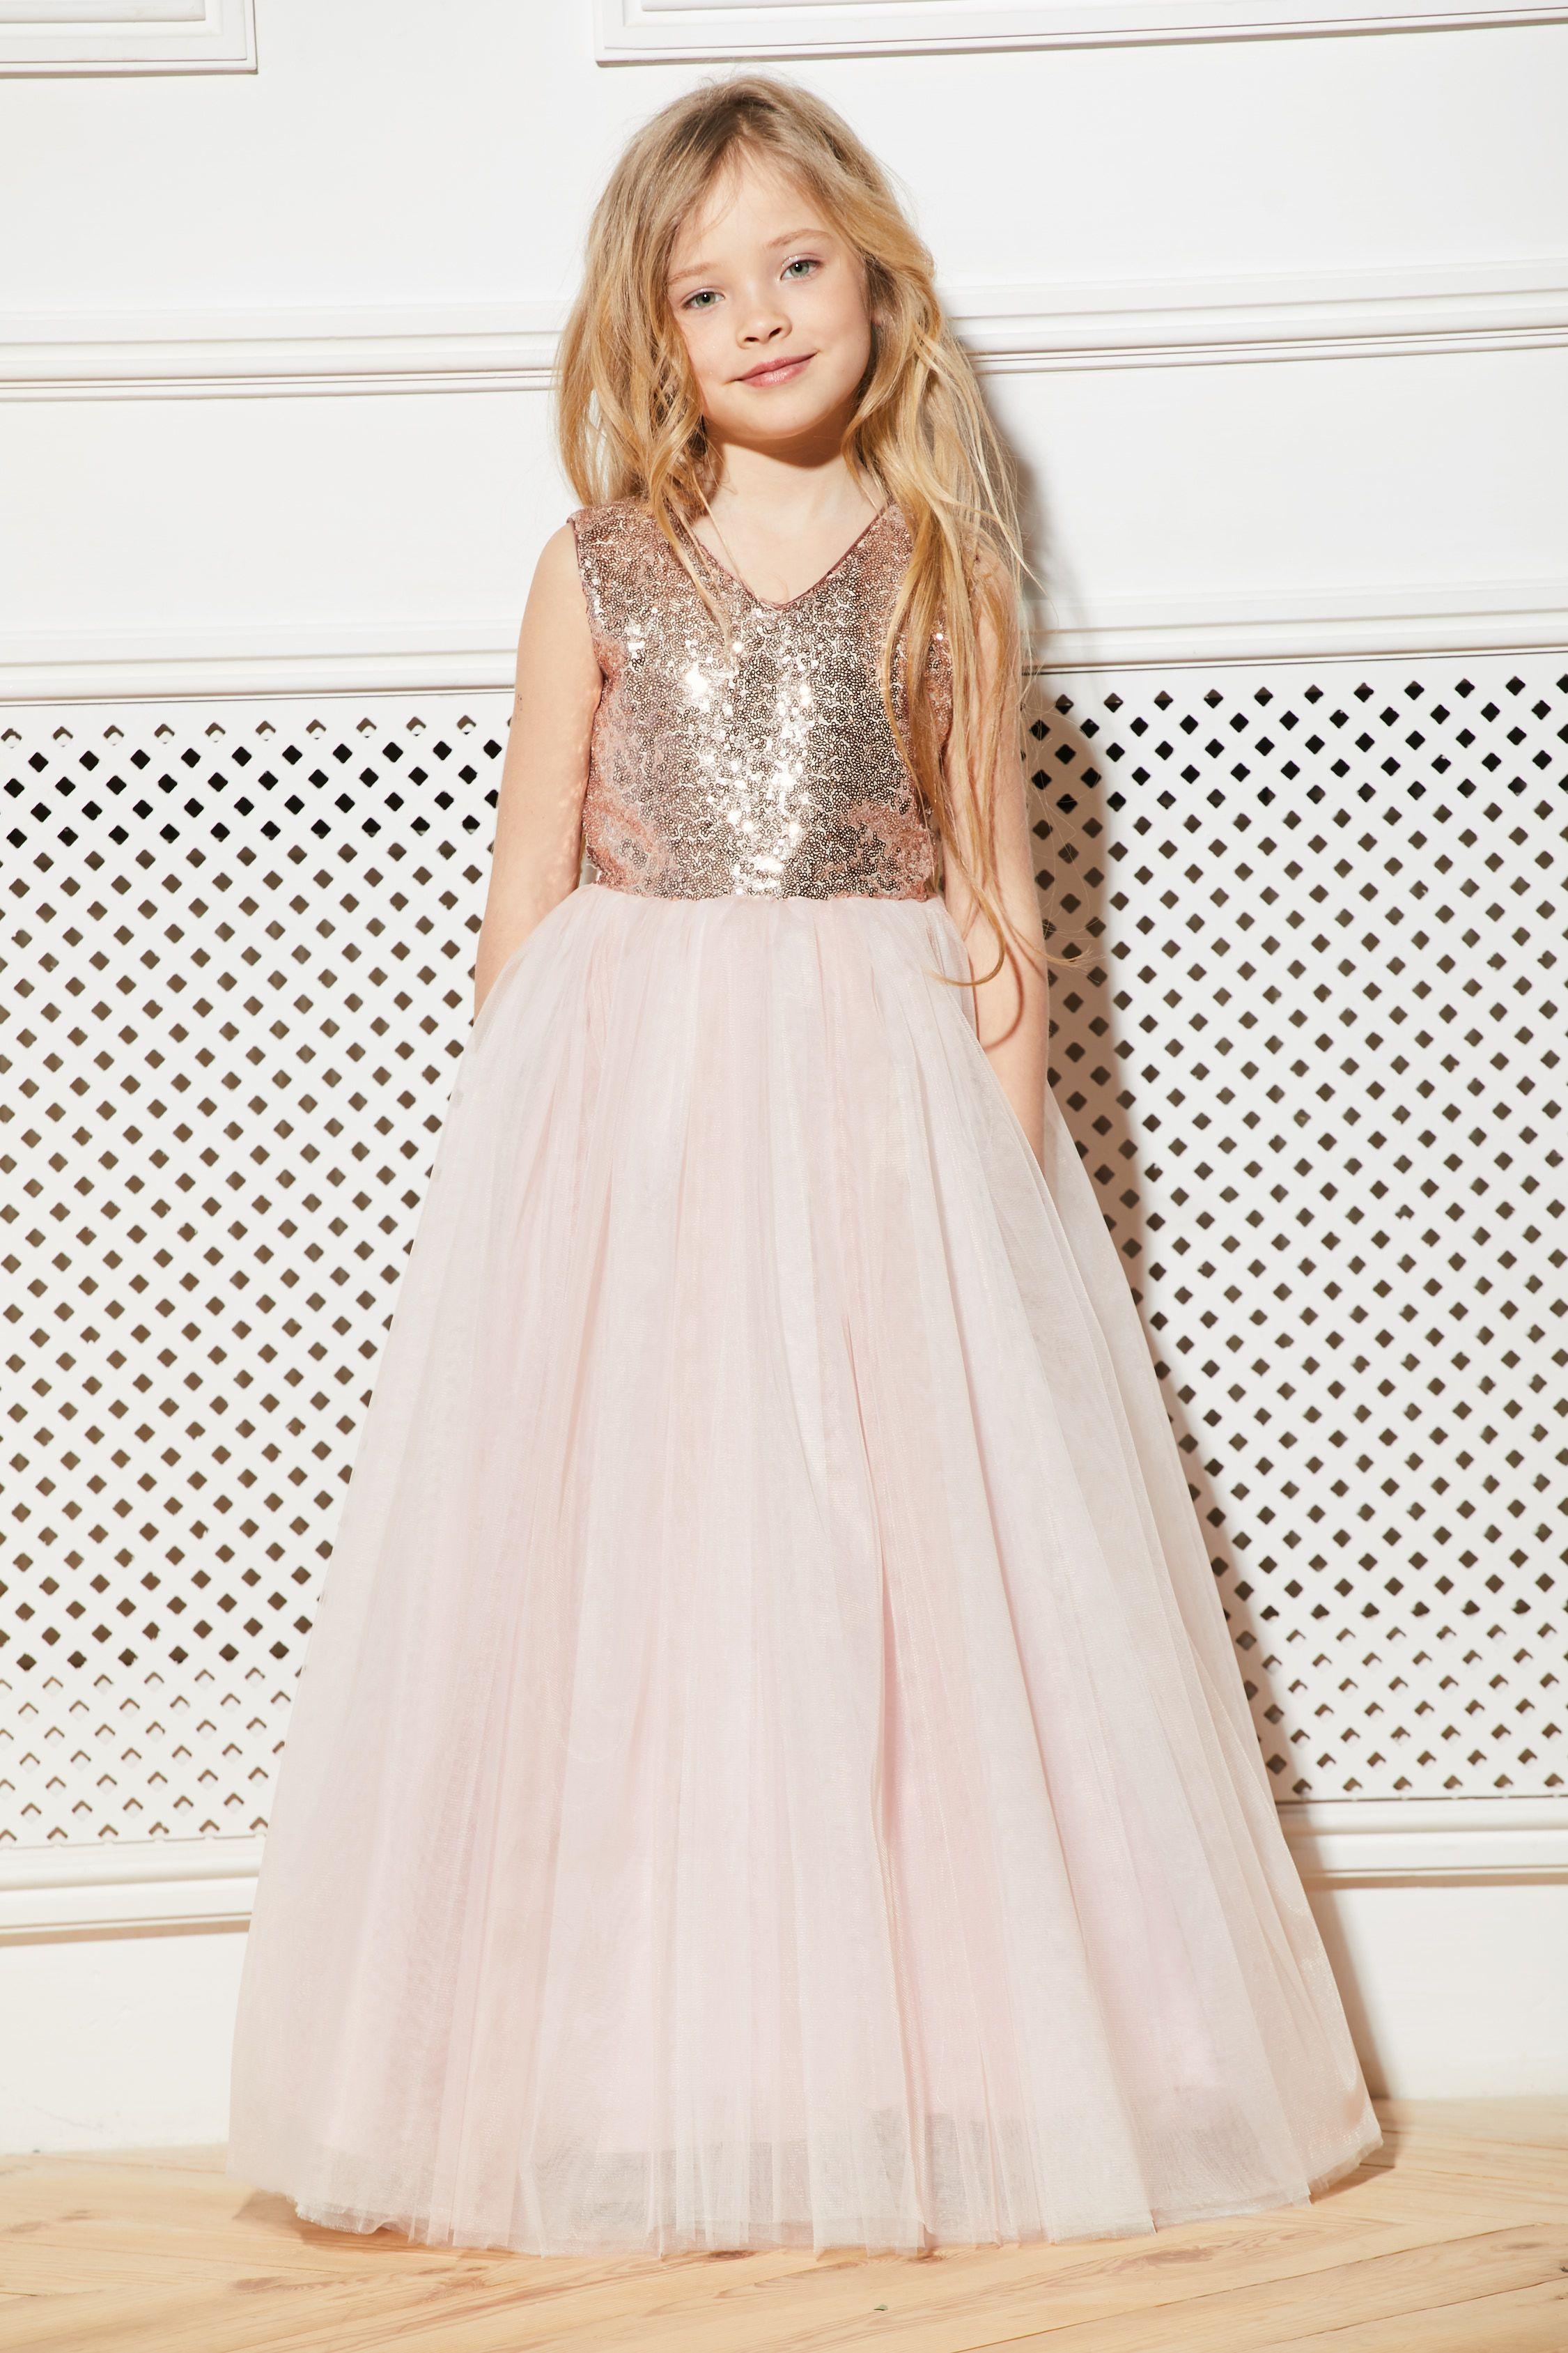 a7534604a07a4 Blush flower girl dress tulle Sequin flower girl dress Pink junior  bridesmaid dress Tutu flower dress Wedding dress Toddler flower dress